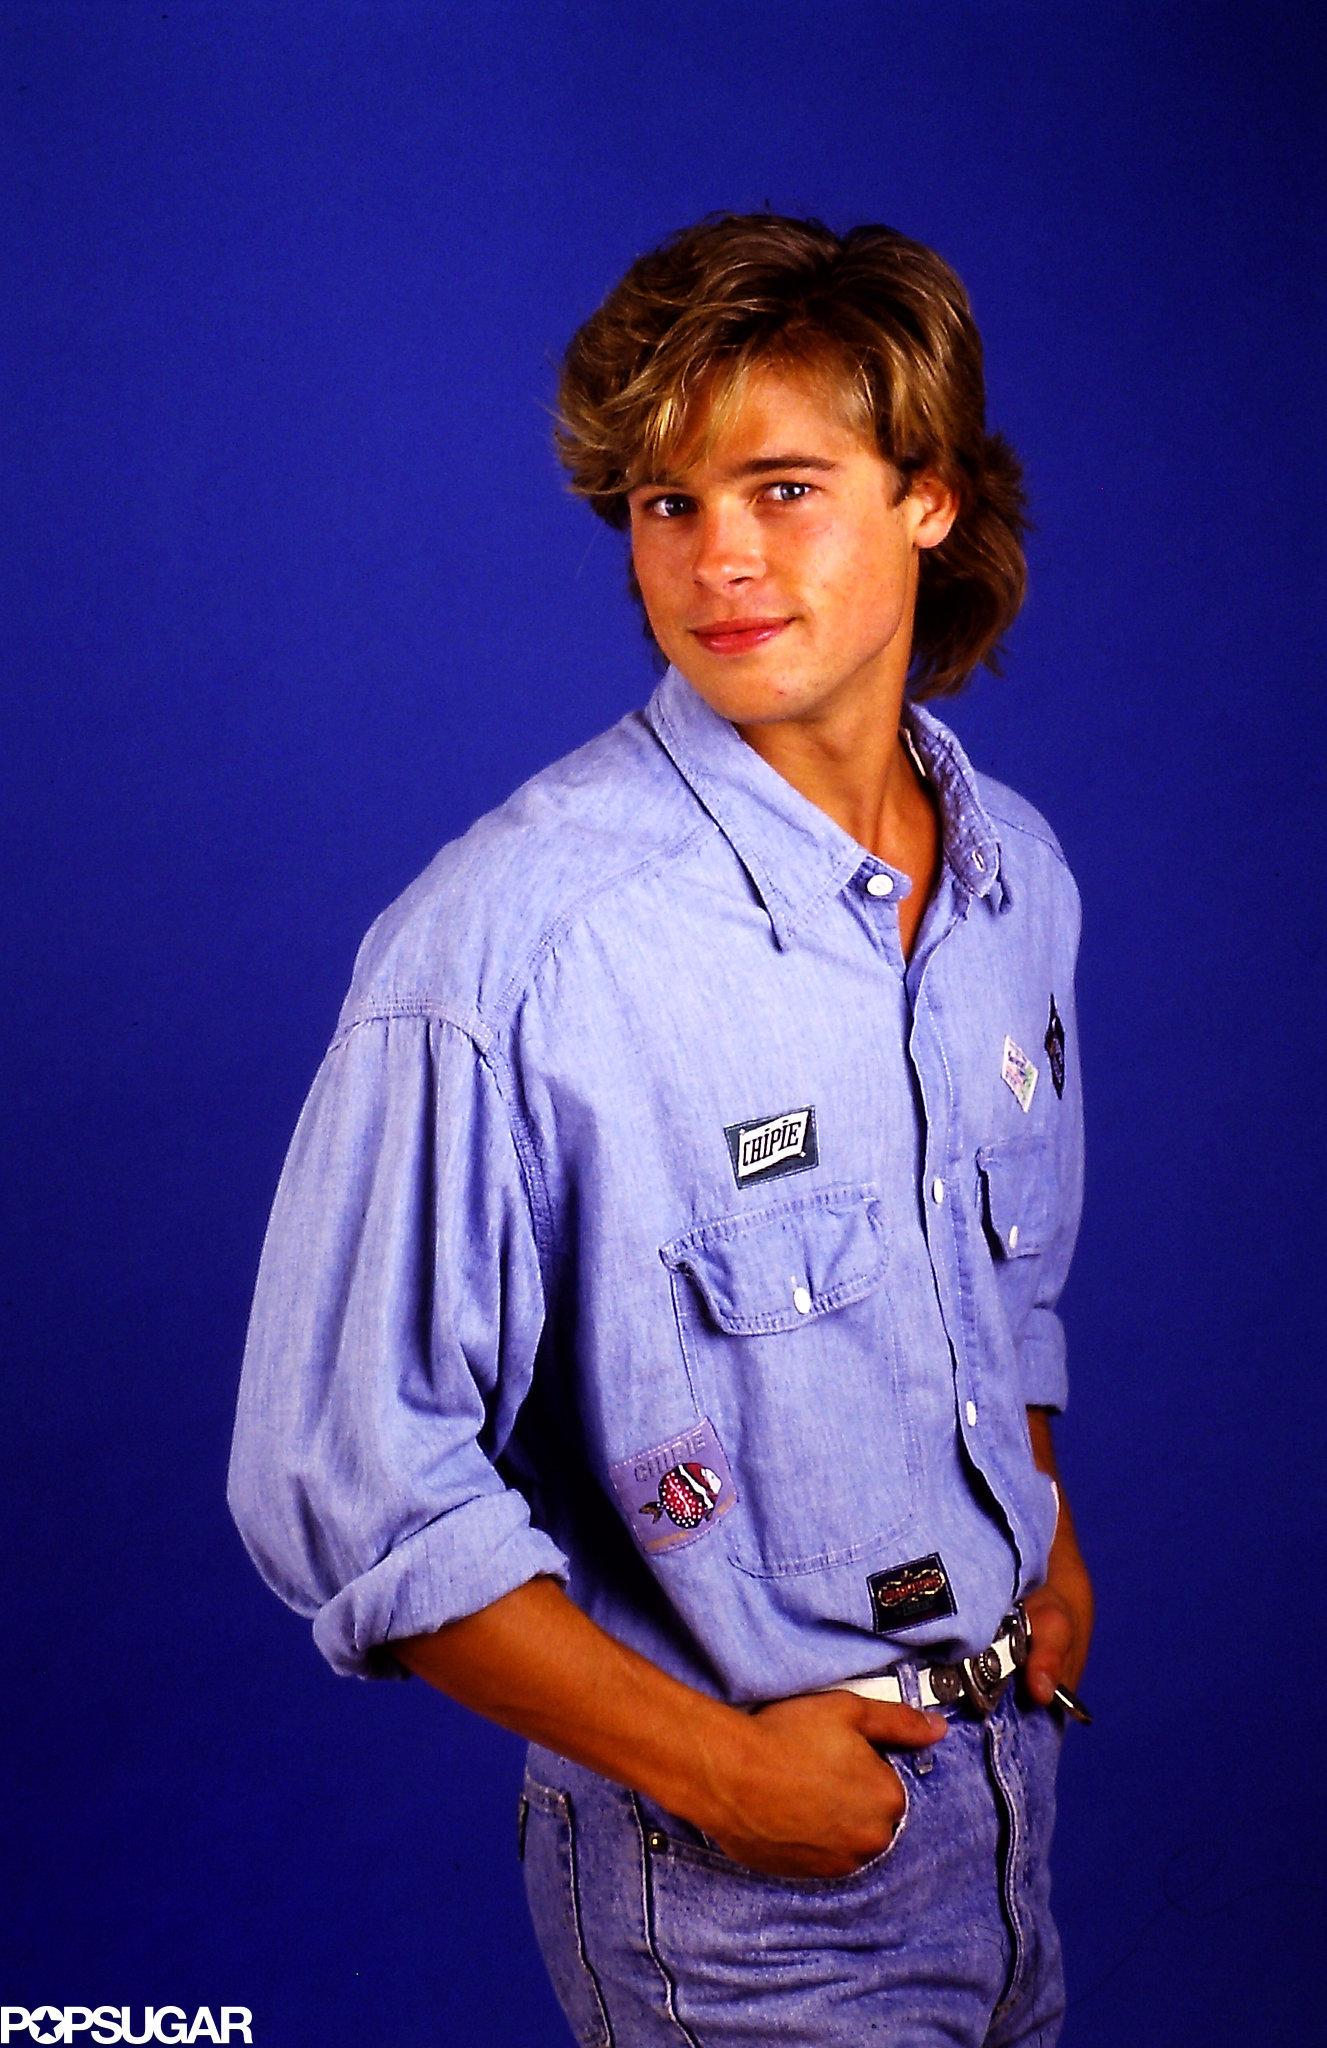 Brad Pitt gossip, latest news, photos, and video.